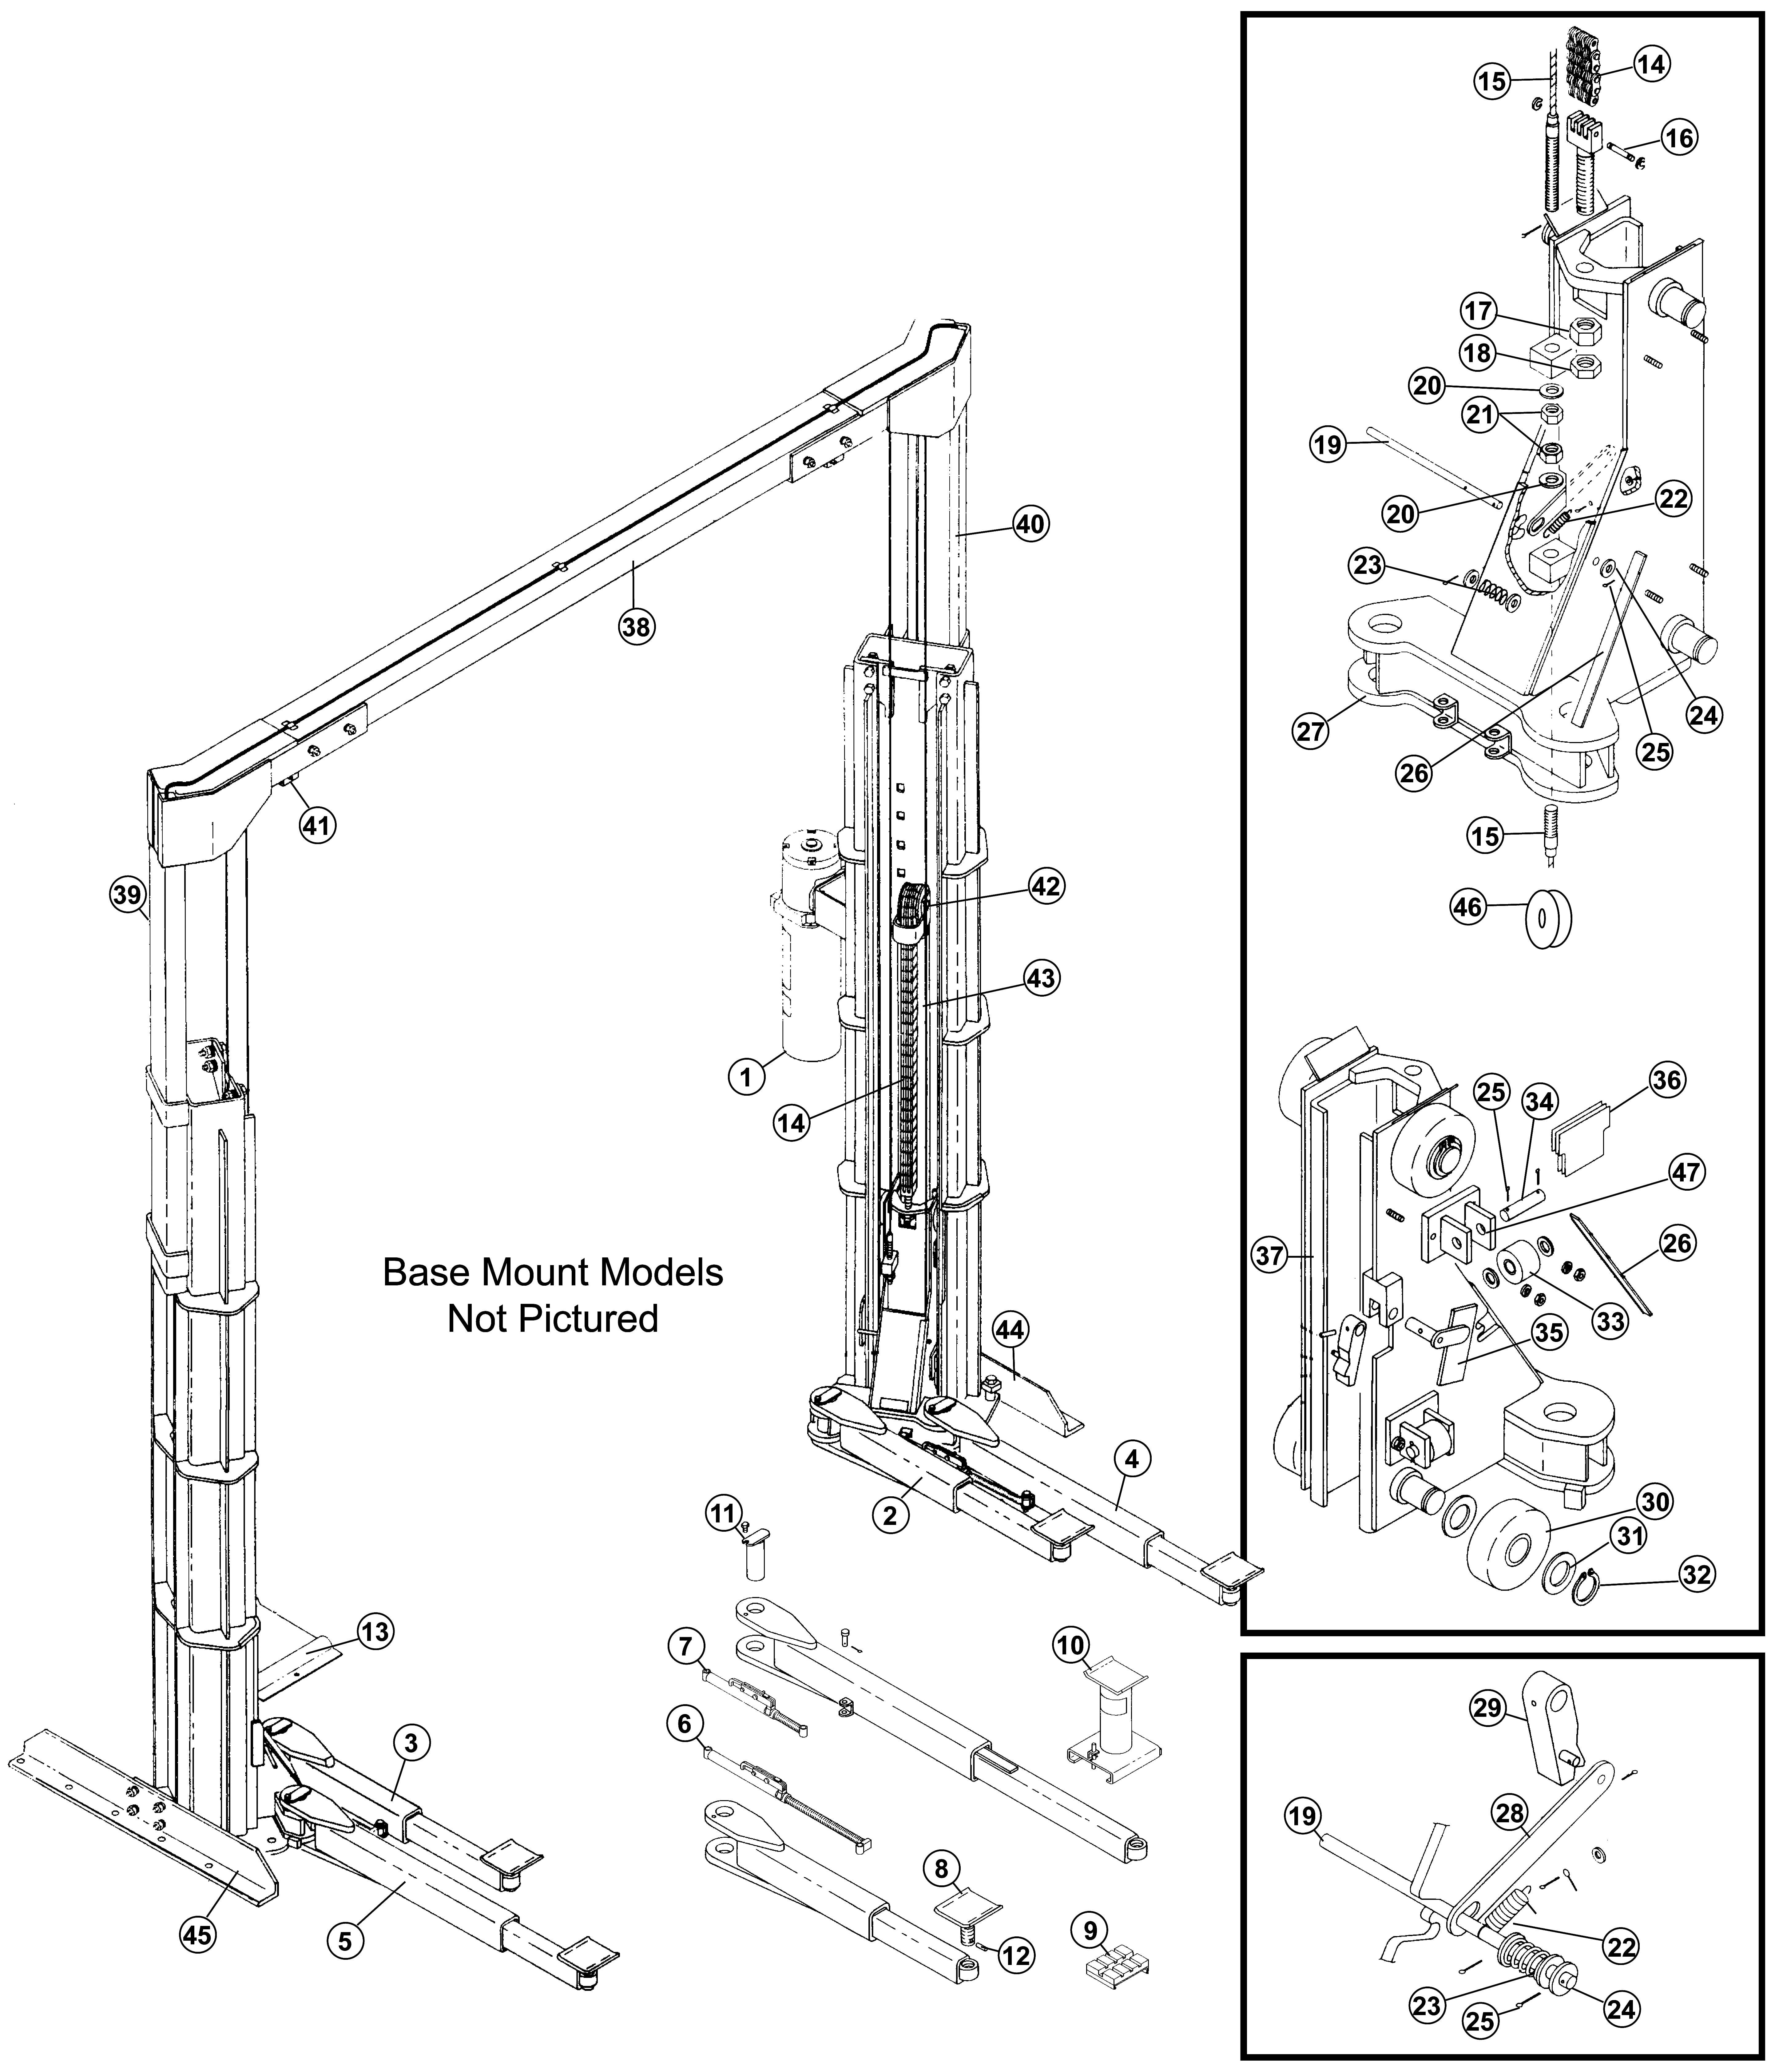 Parts for Gilbarco Lifts GFF-90 | SVI International, Inc. | Tuxedo Car Lift Wiring Diagram |  | SVI International, Inc